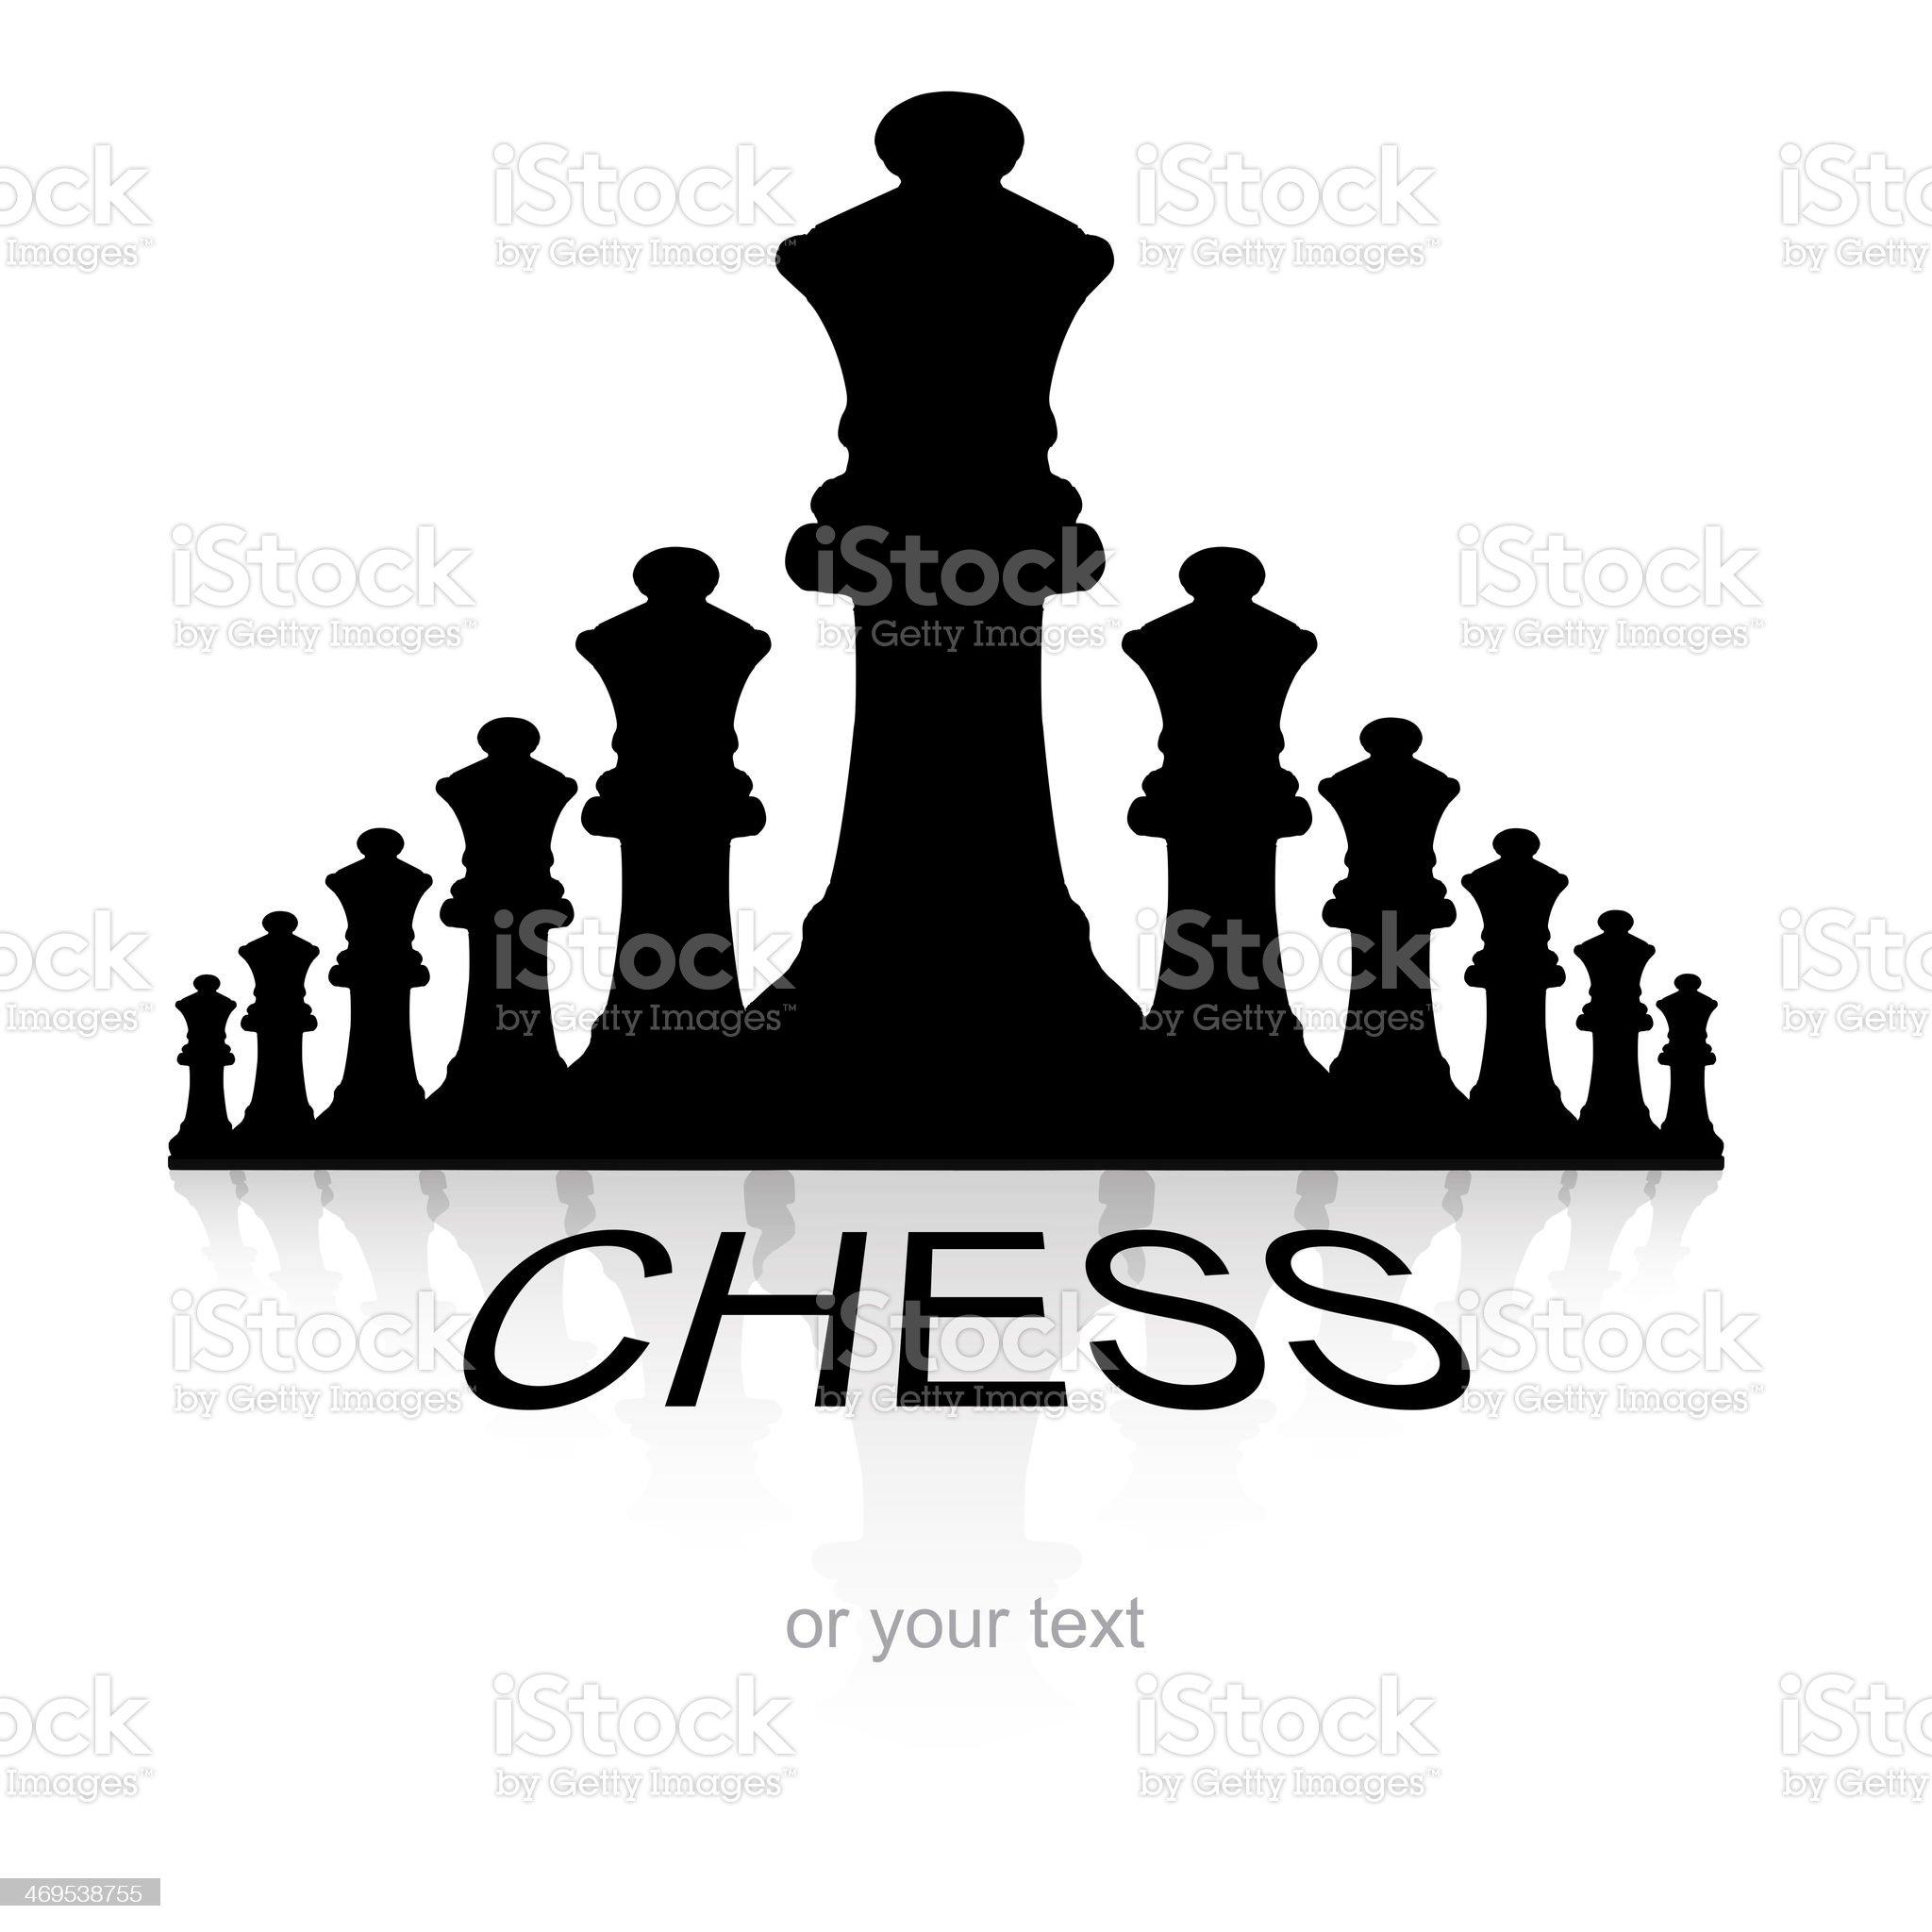 Chess logotype royalty-free stock vector art